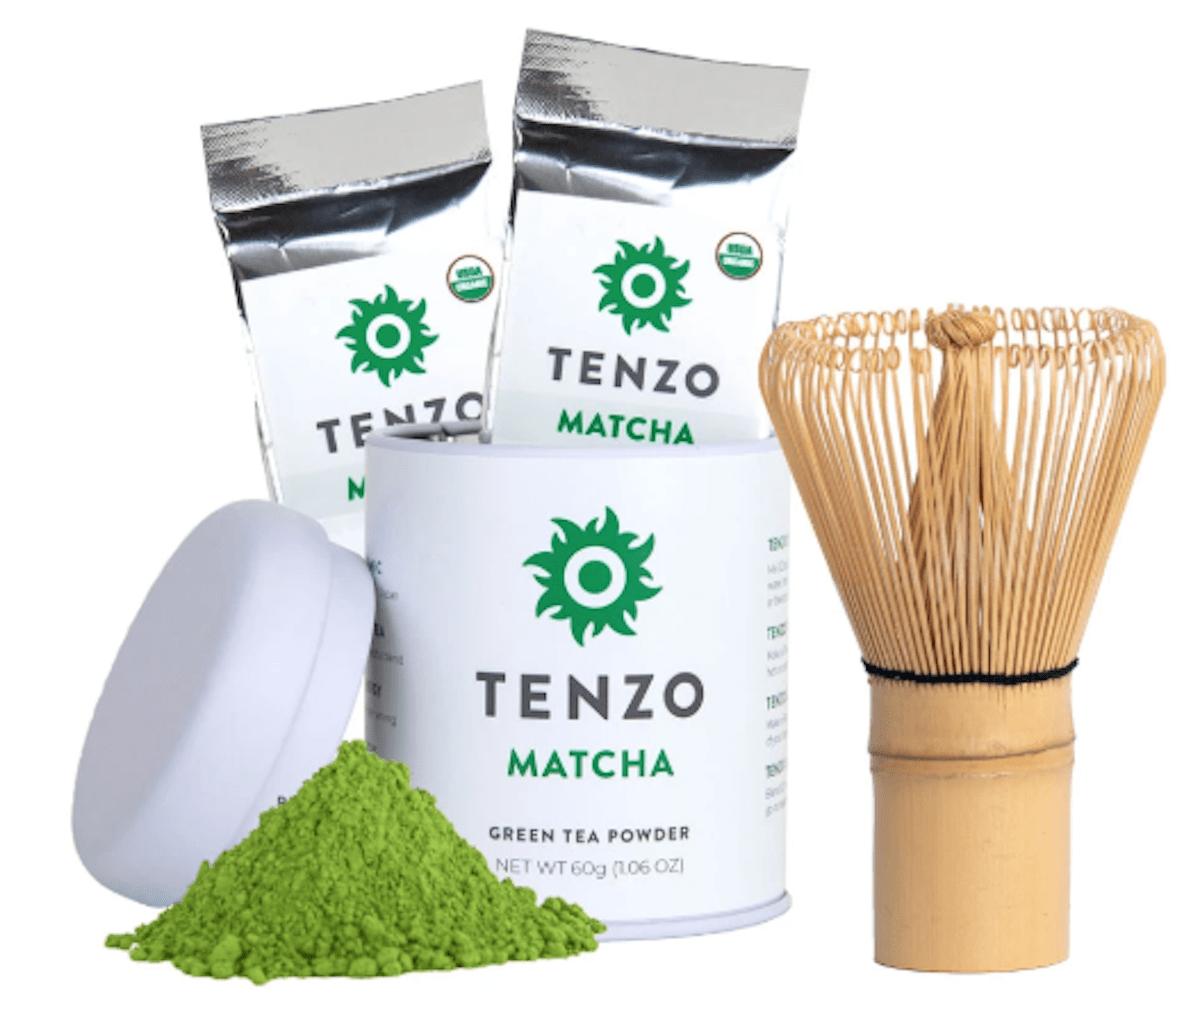 Tenzo Matcha Tea